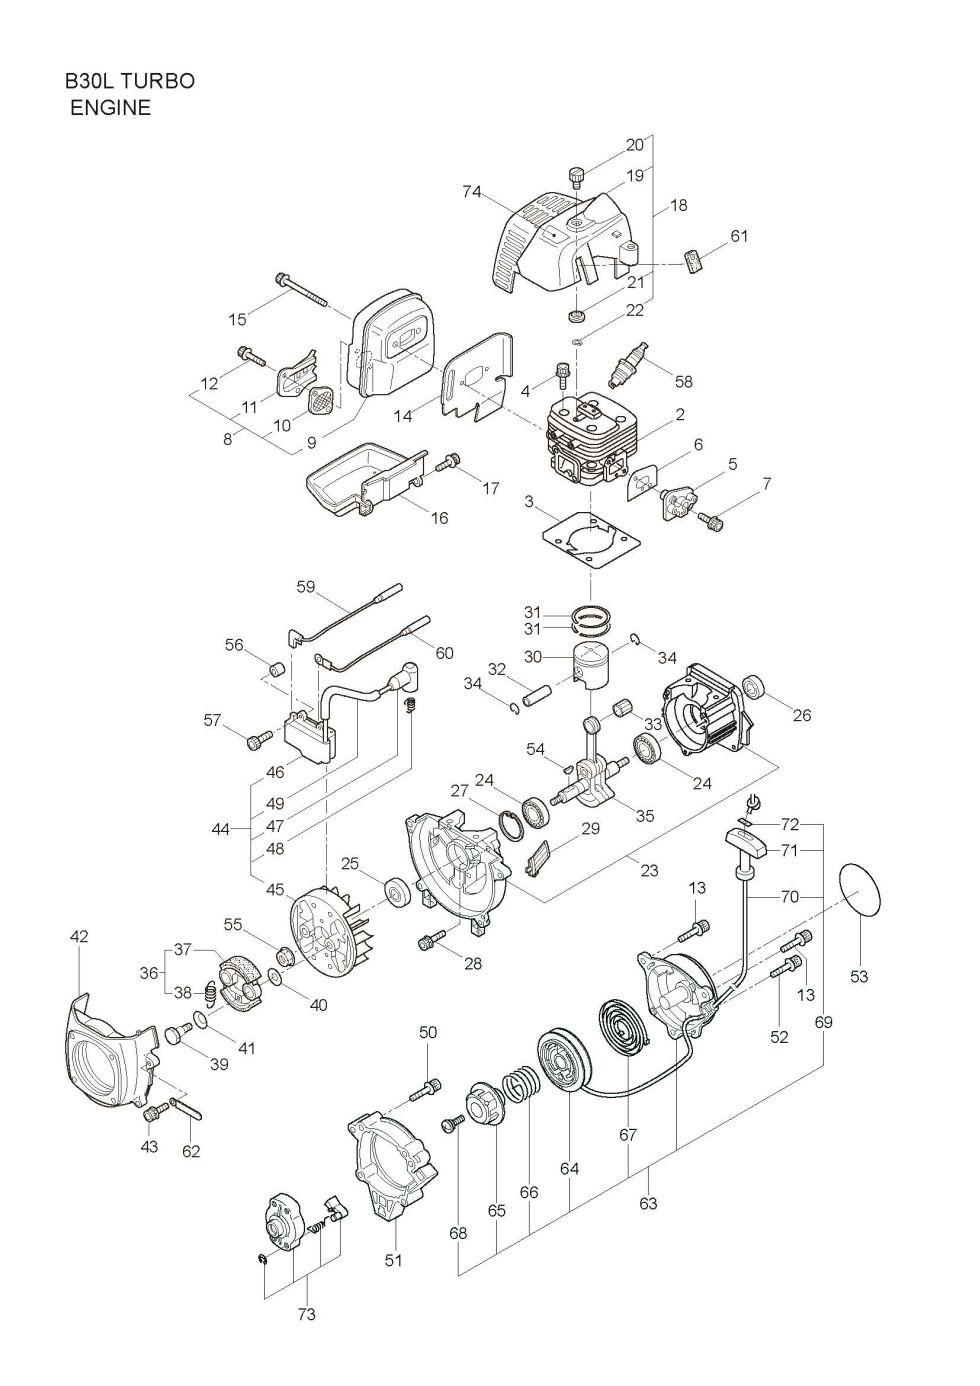 Engine ponents piston in addition mclaren f1 engine diagram additionally turbo parts diagram moreover 6bta cummins